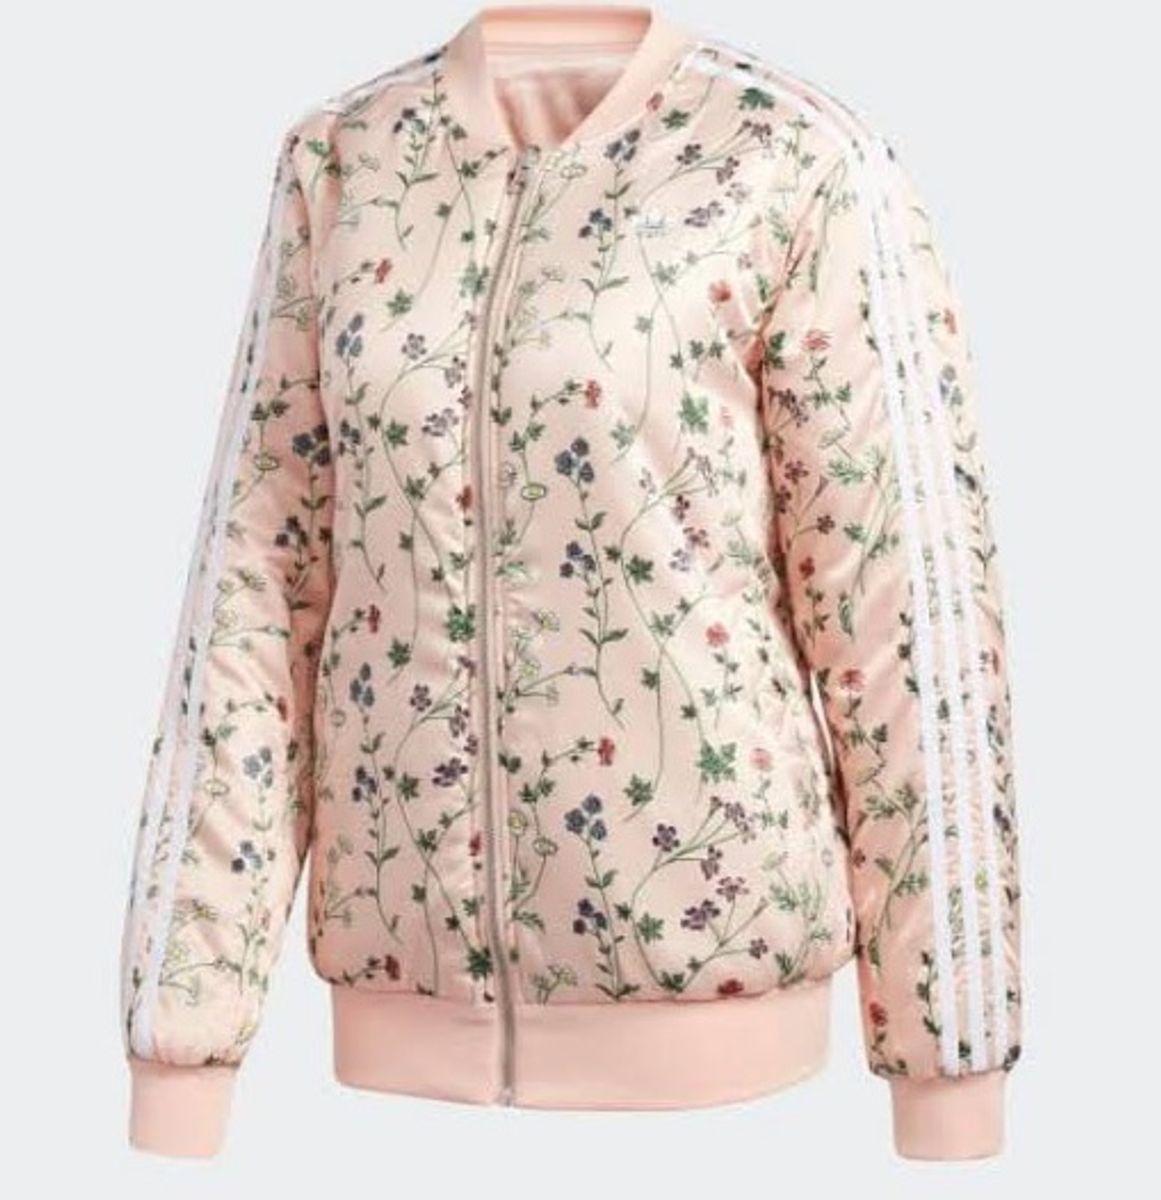 filosofía biología Macadán  Jaqueta Bomber Adidas | Casaco Feminino Adidas Usado 34593249 | enjoei